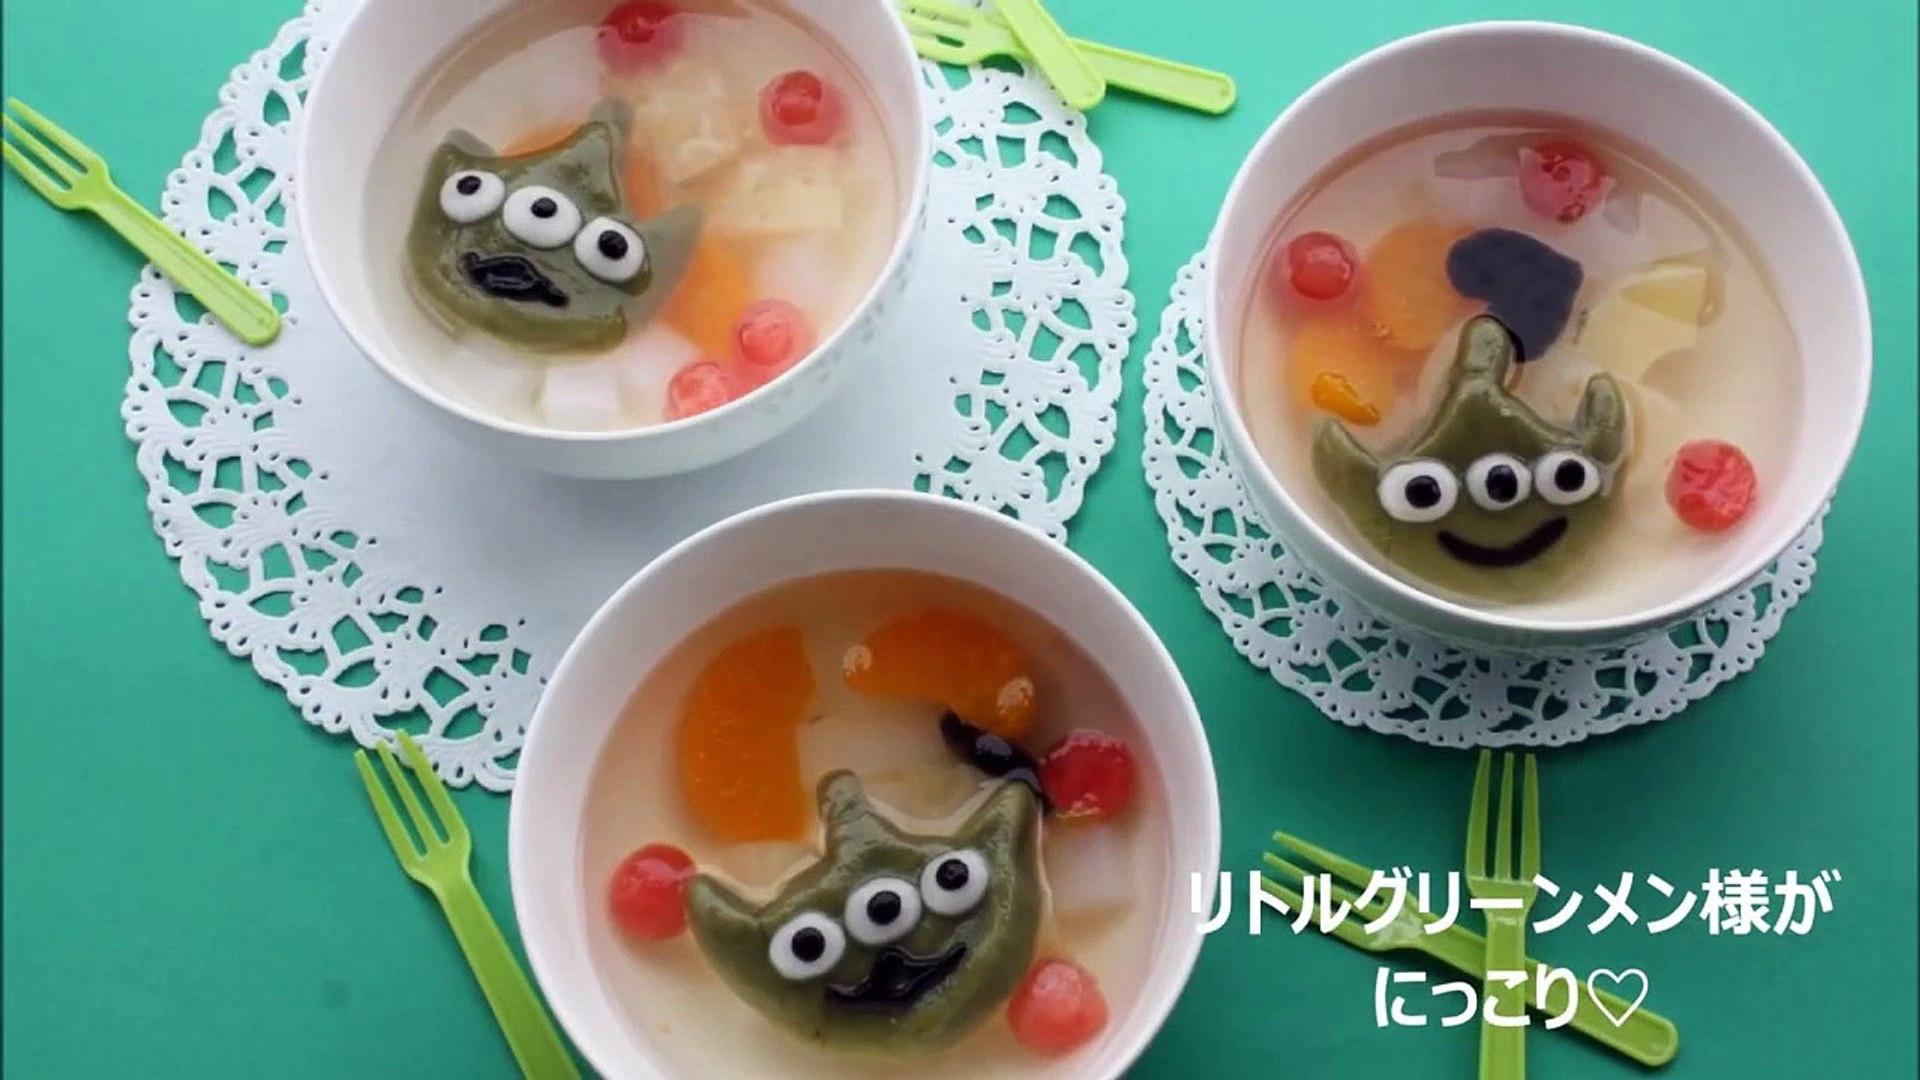 How To Make Toystory Little Green Men Shiratama リトルグリーンメン